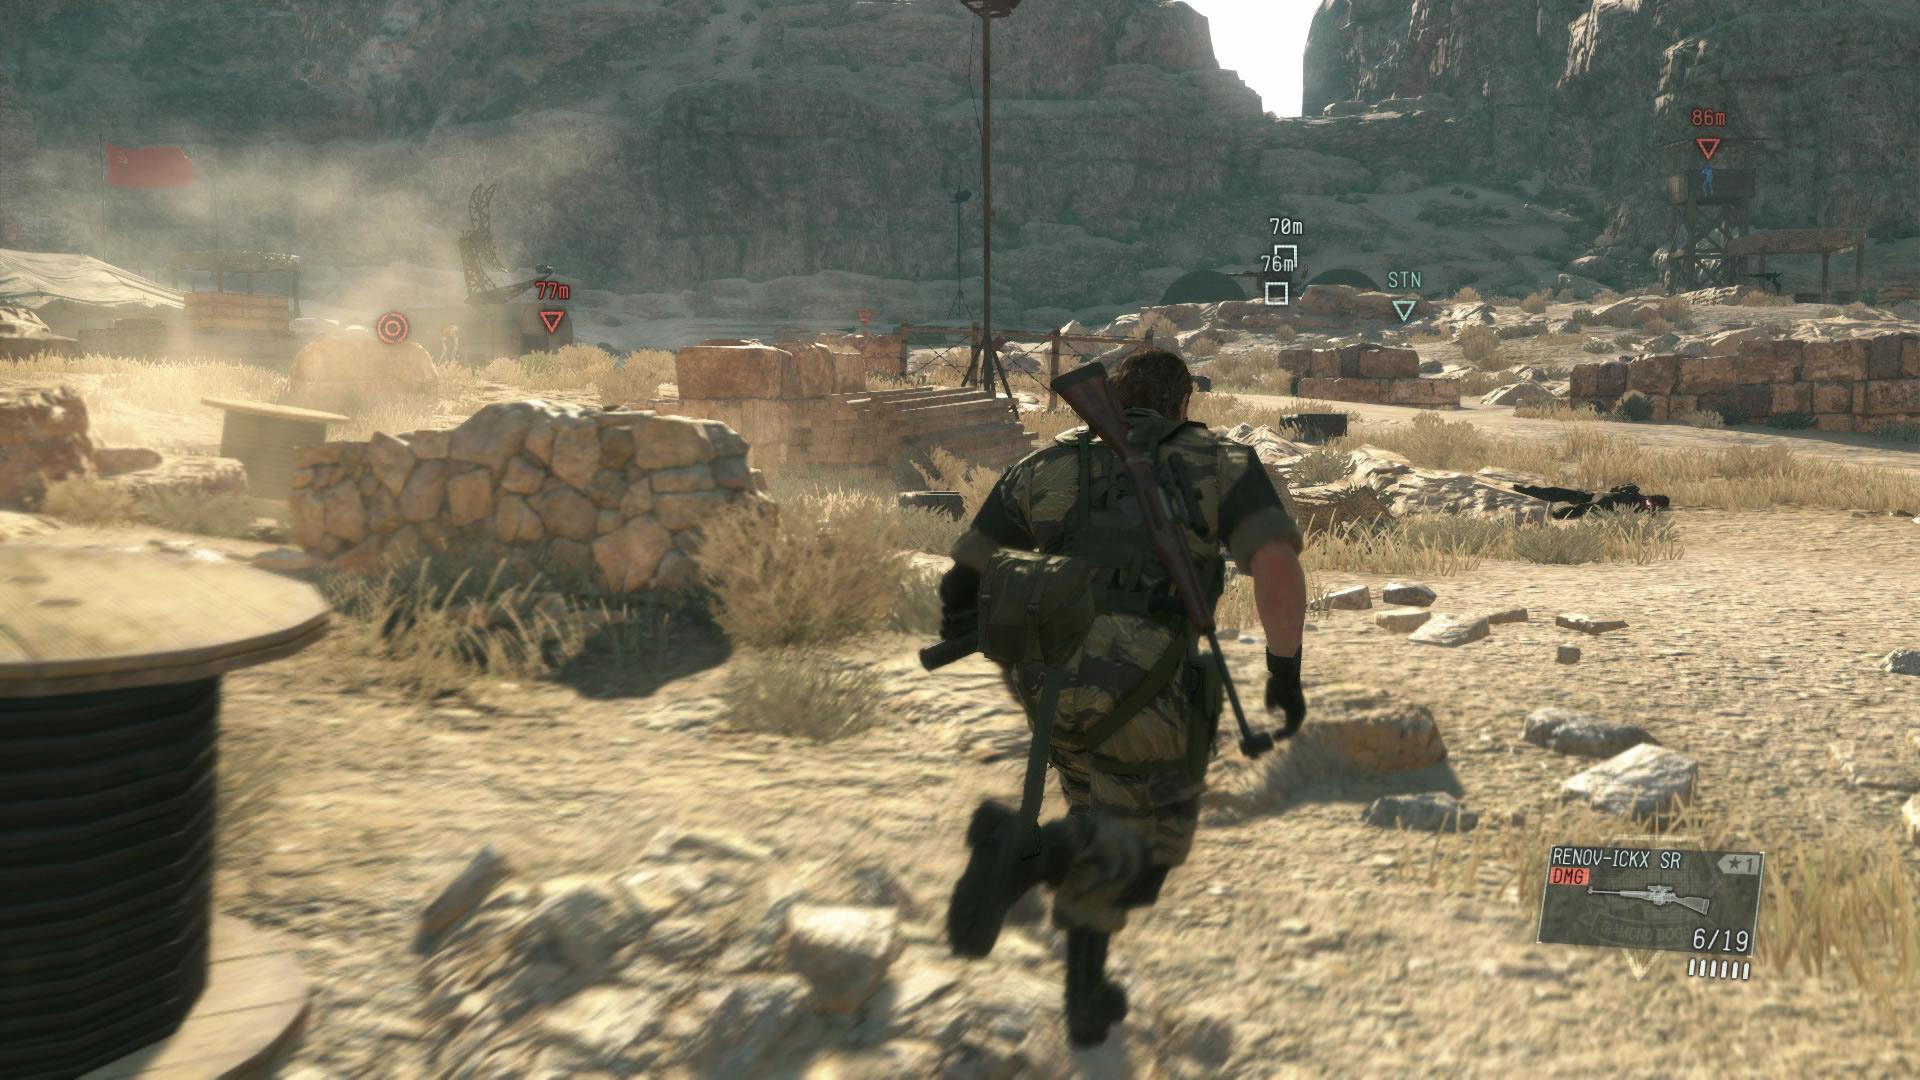 Metal Gear Solid V: The Phantom Pain Official Thread